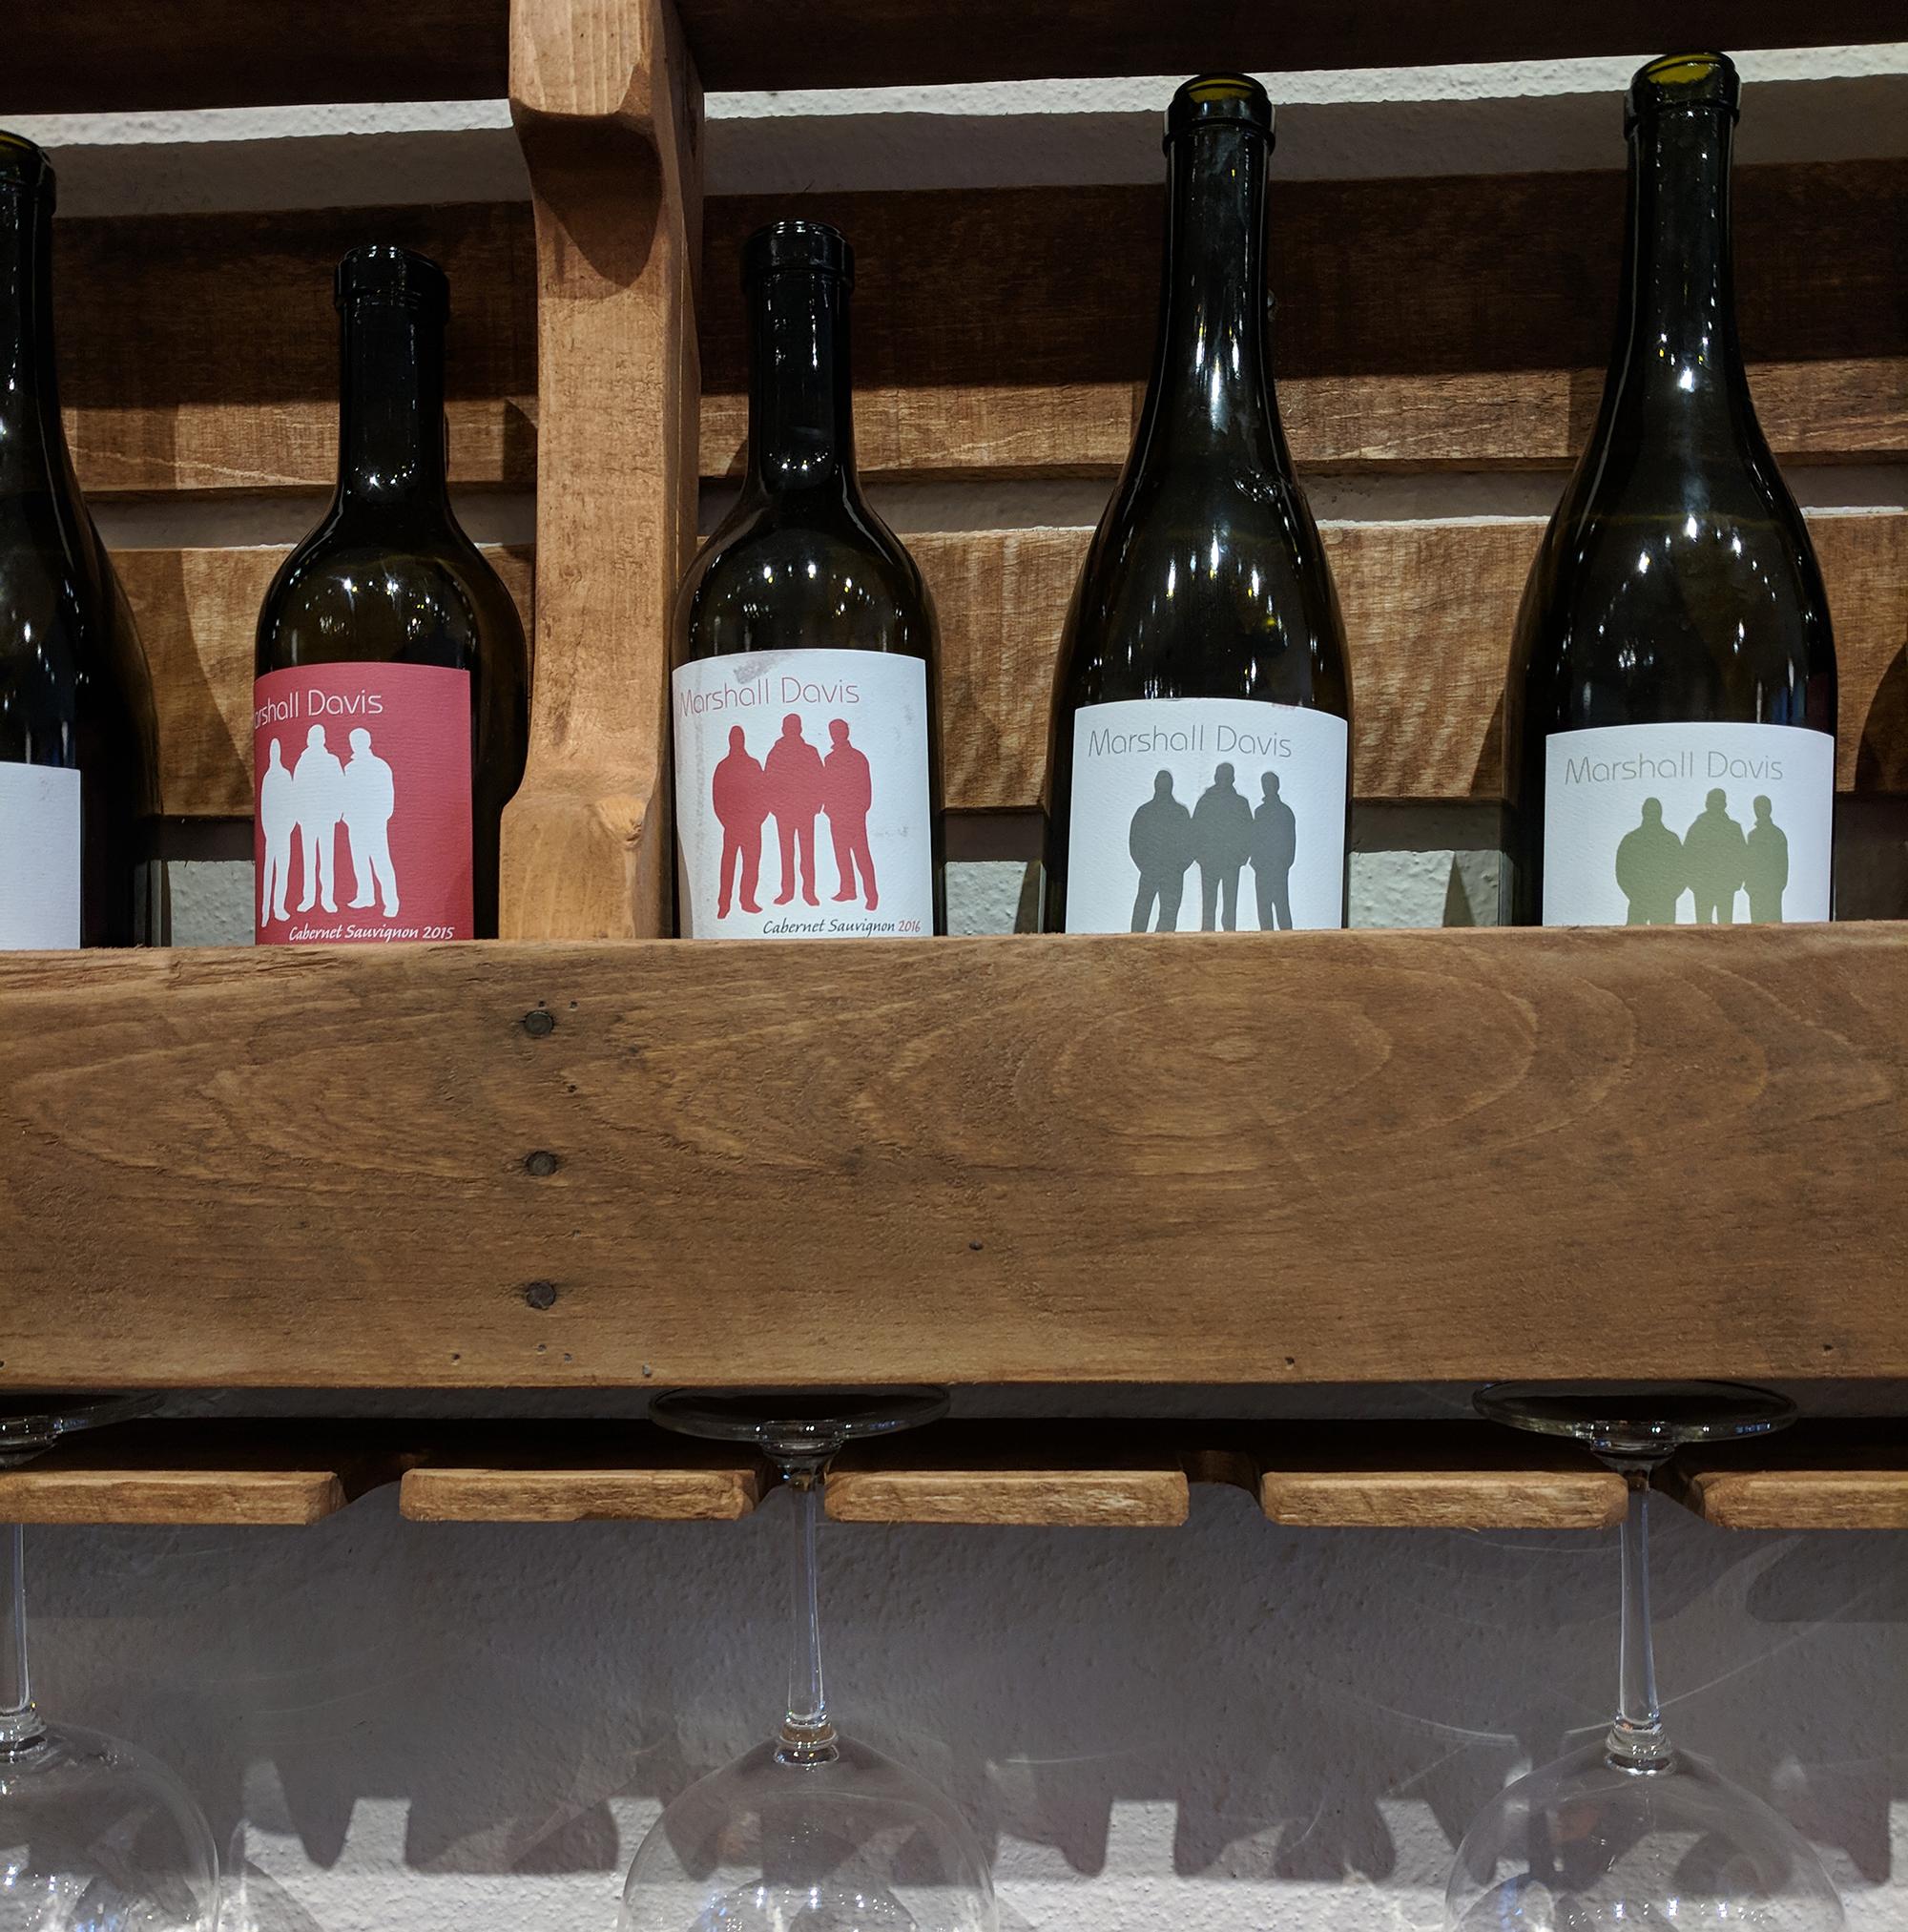 Marshall Davis wines.jpg